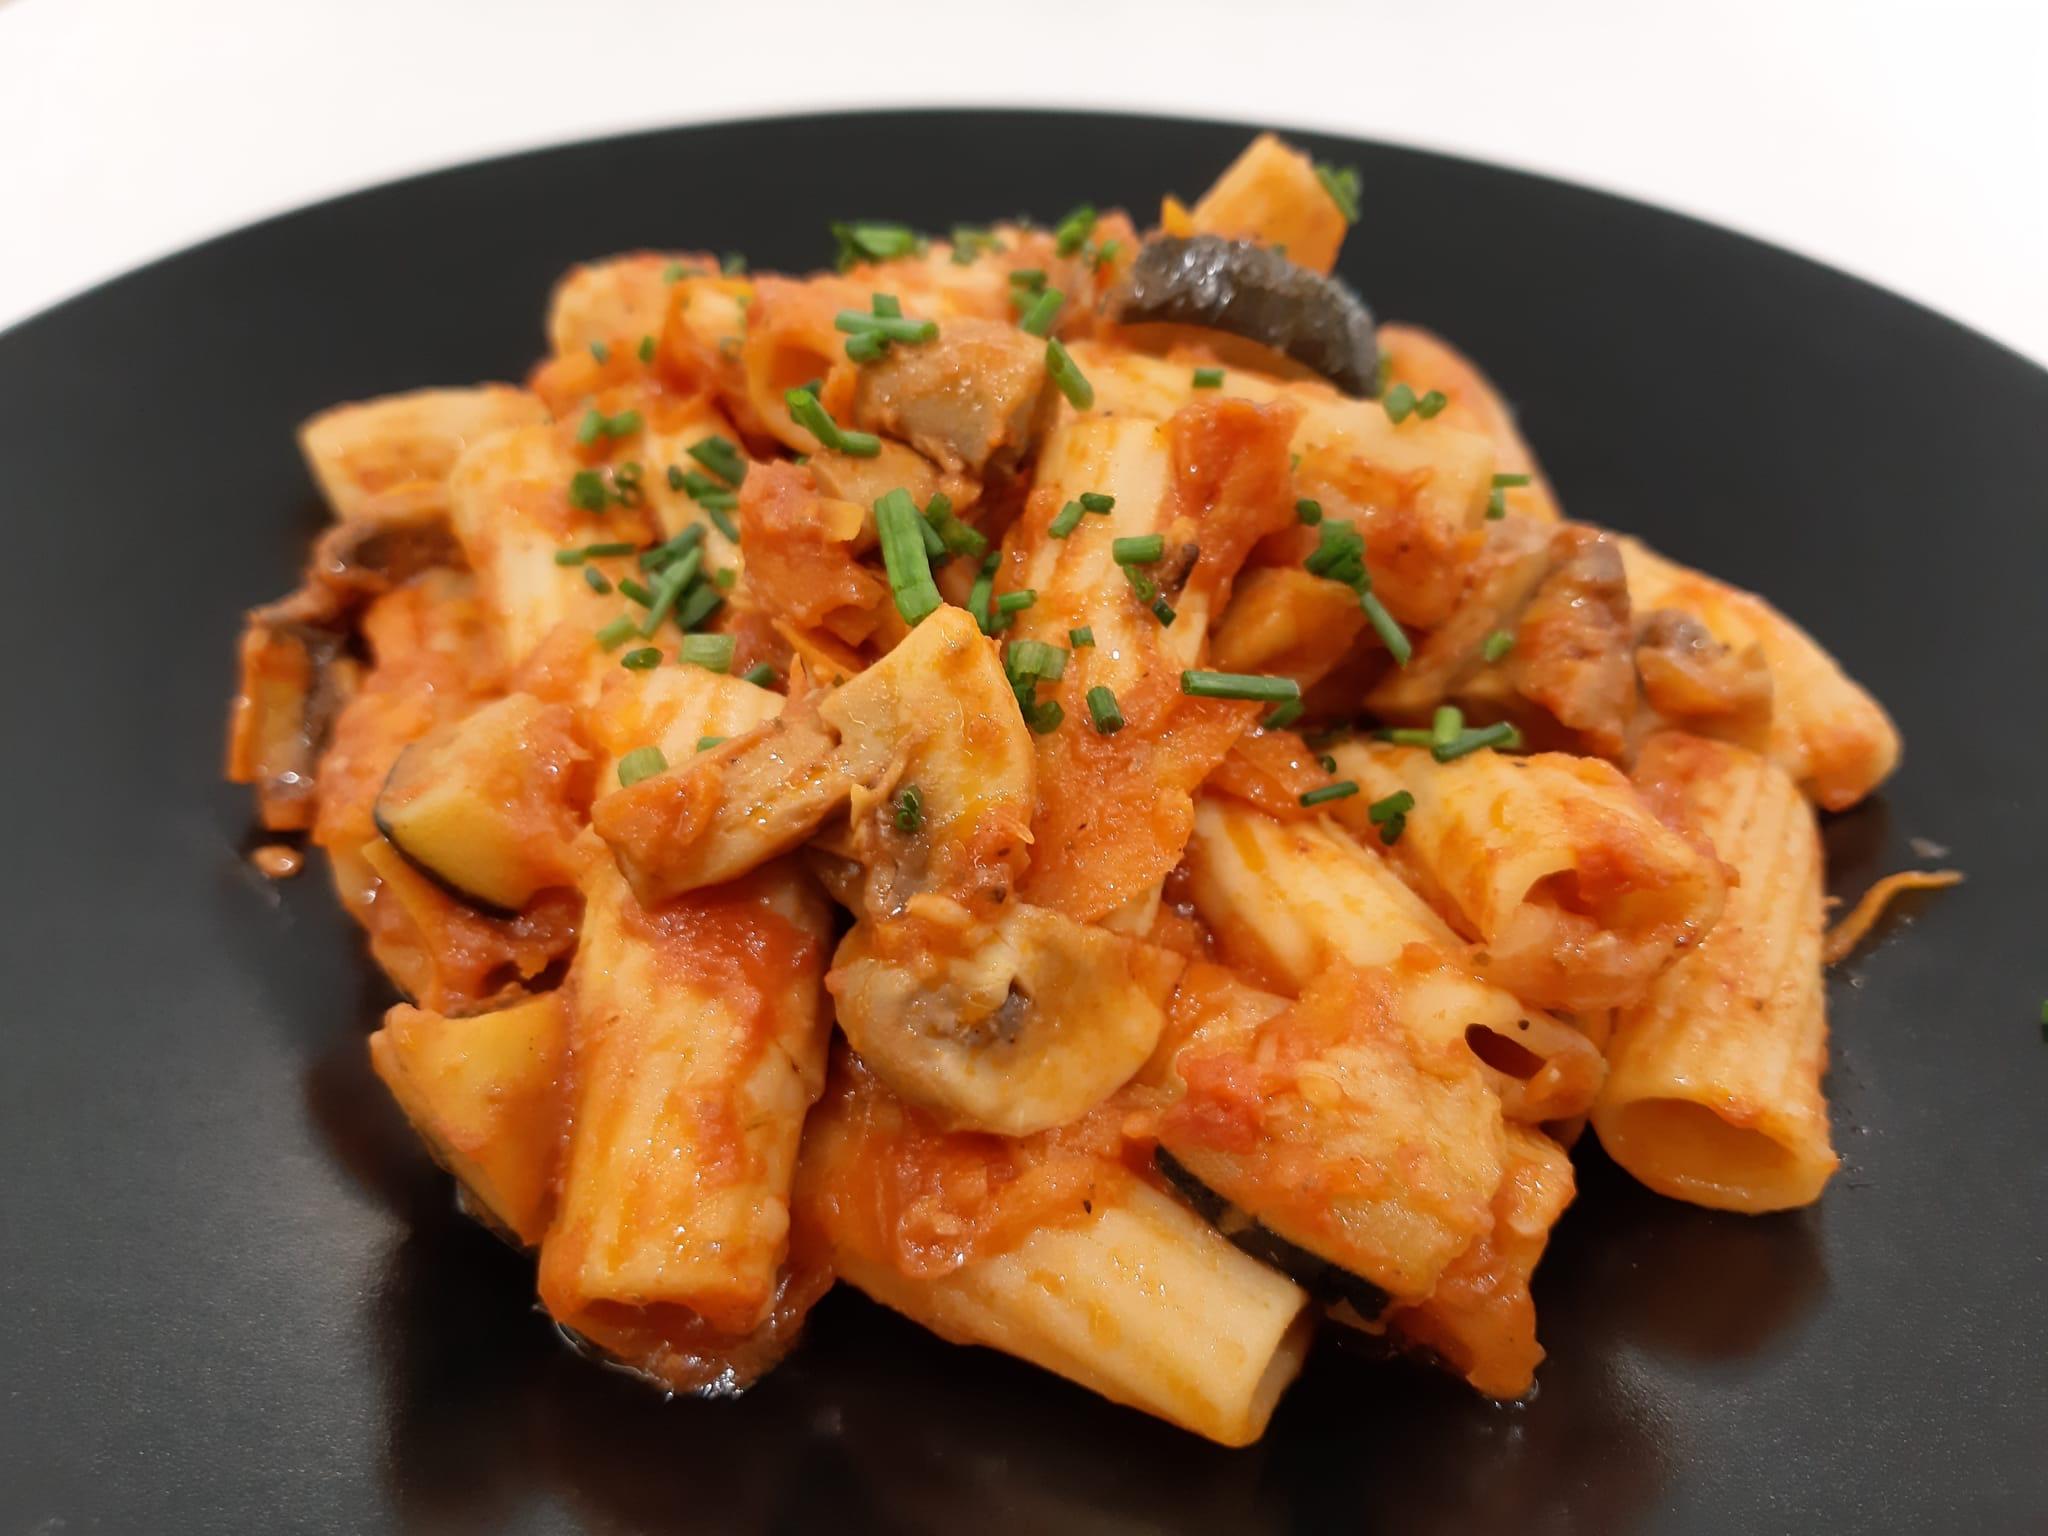 Penne a la boloñesa vegetal restaurante mediterráneo Barcelona